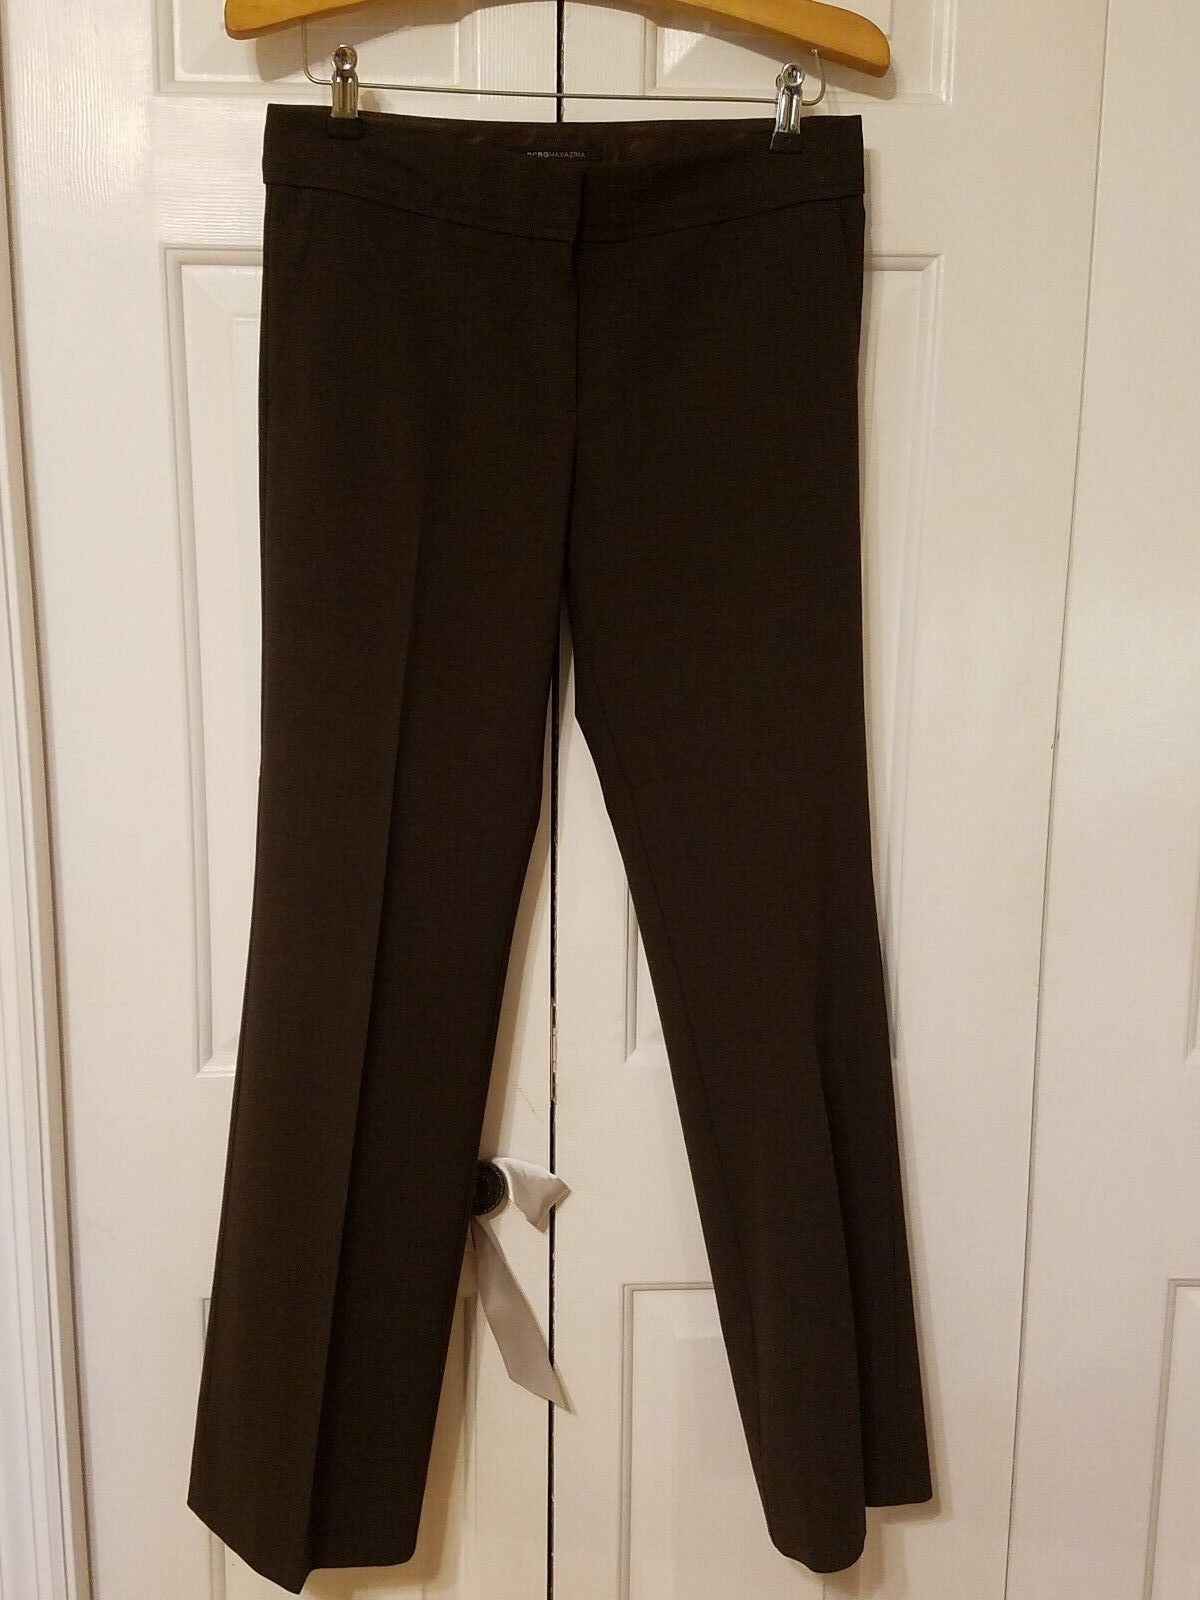 BCBGMAXAZRIA Brown Wool Blend Dress Pants Größe 4